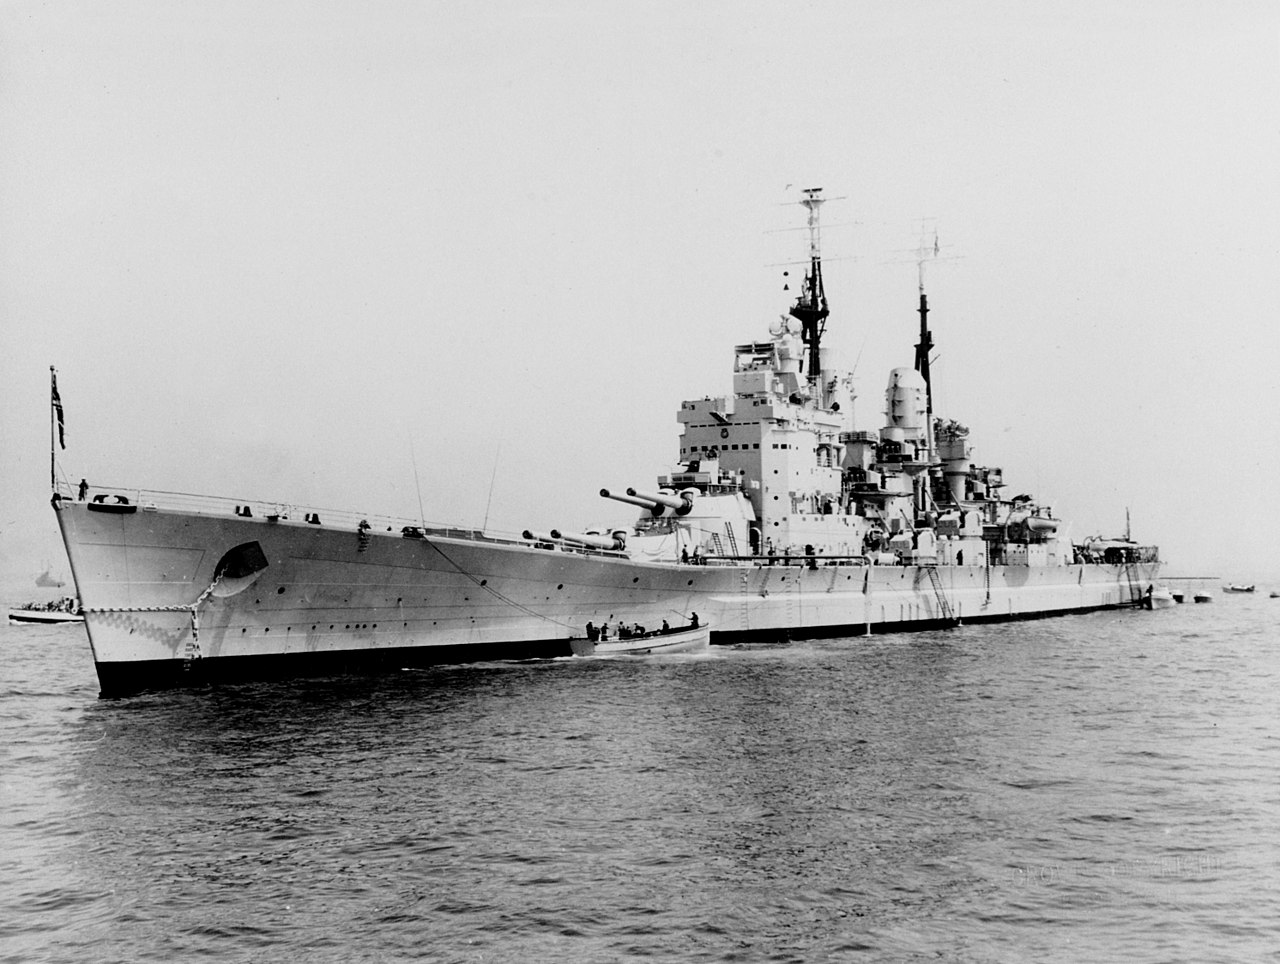 1280px-HMS_Vanguard_(Battleship,_1946-19